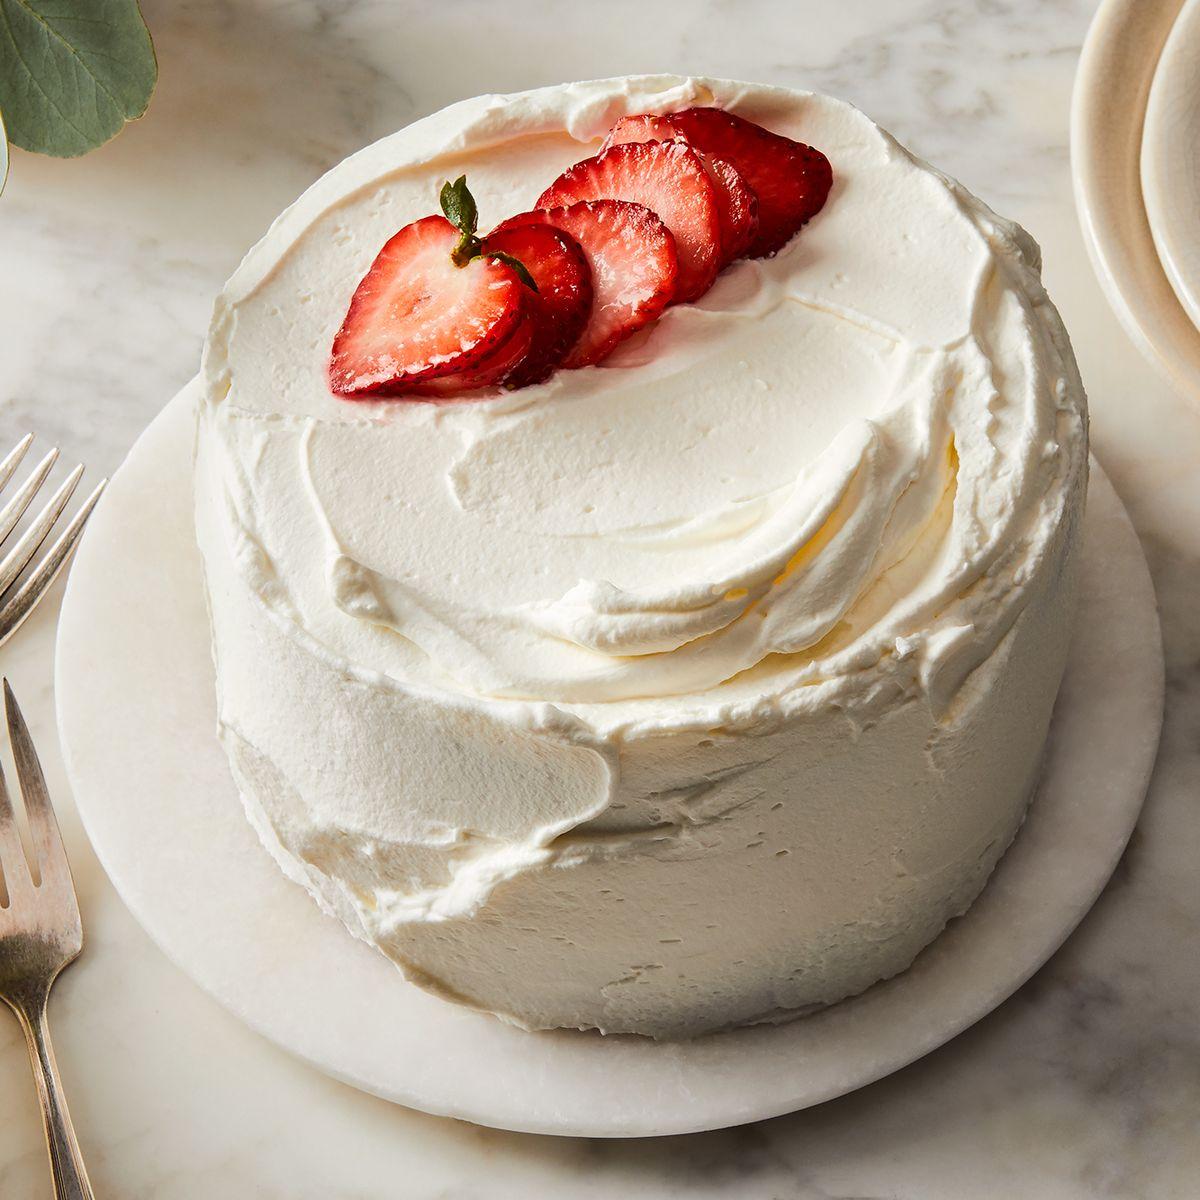 Enjoyable Korean Fresh Cream Cake Recipe On Food52 Personalised Birthday Cards Arneslily Jamesorg